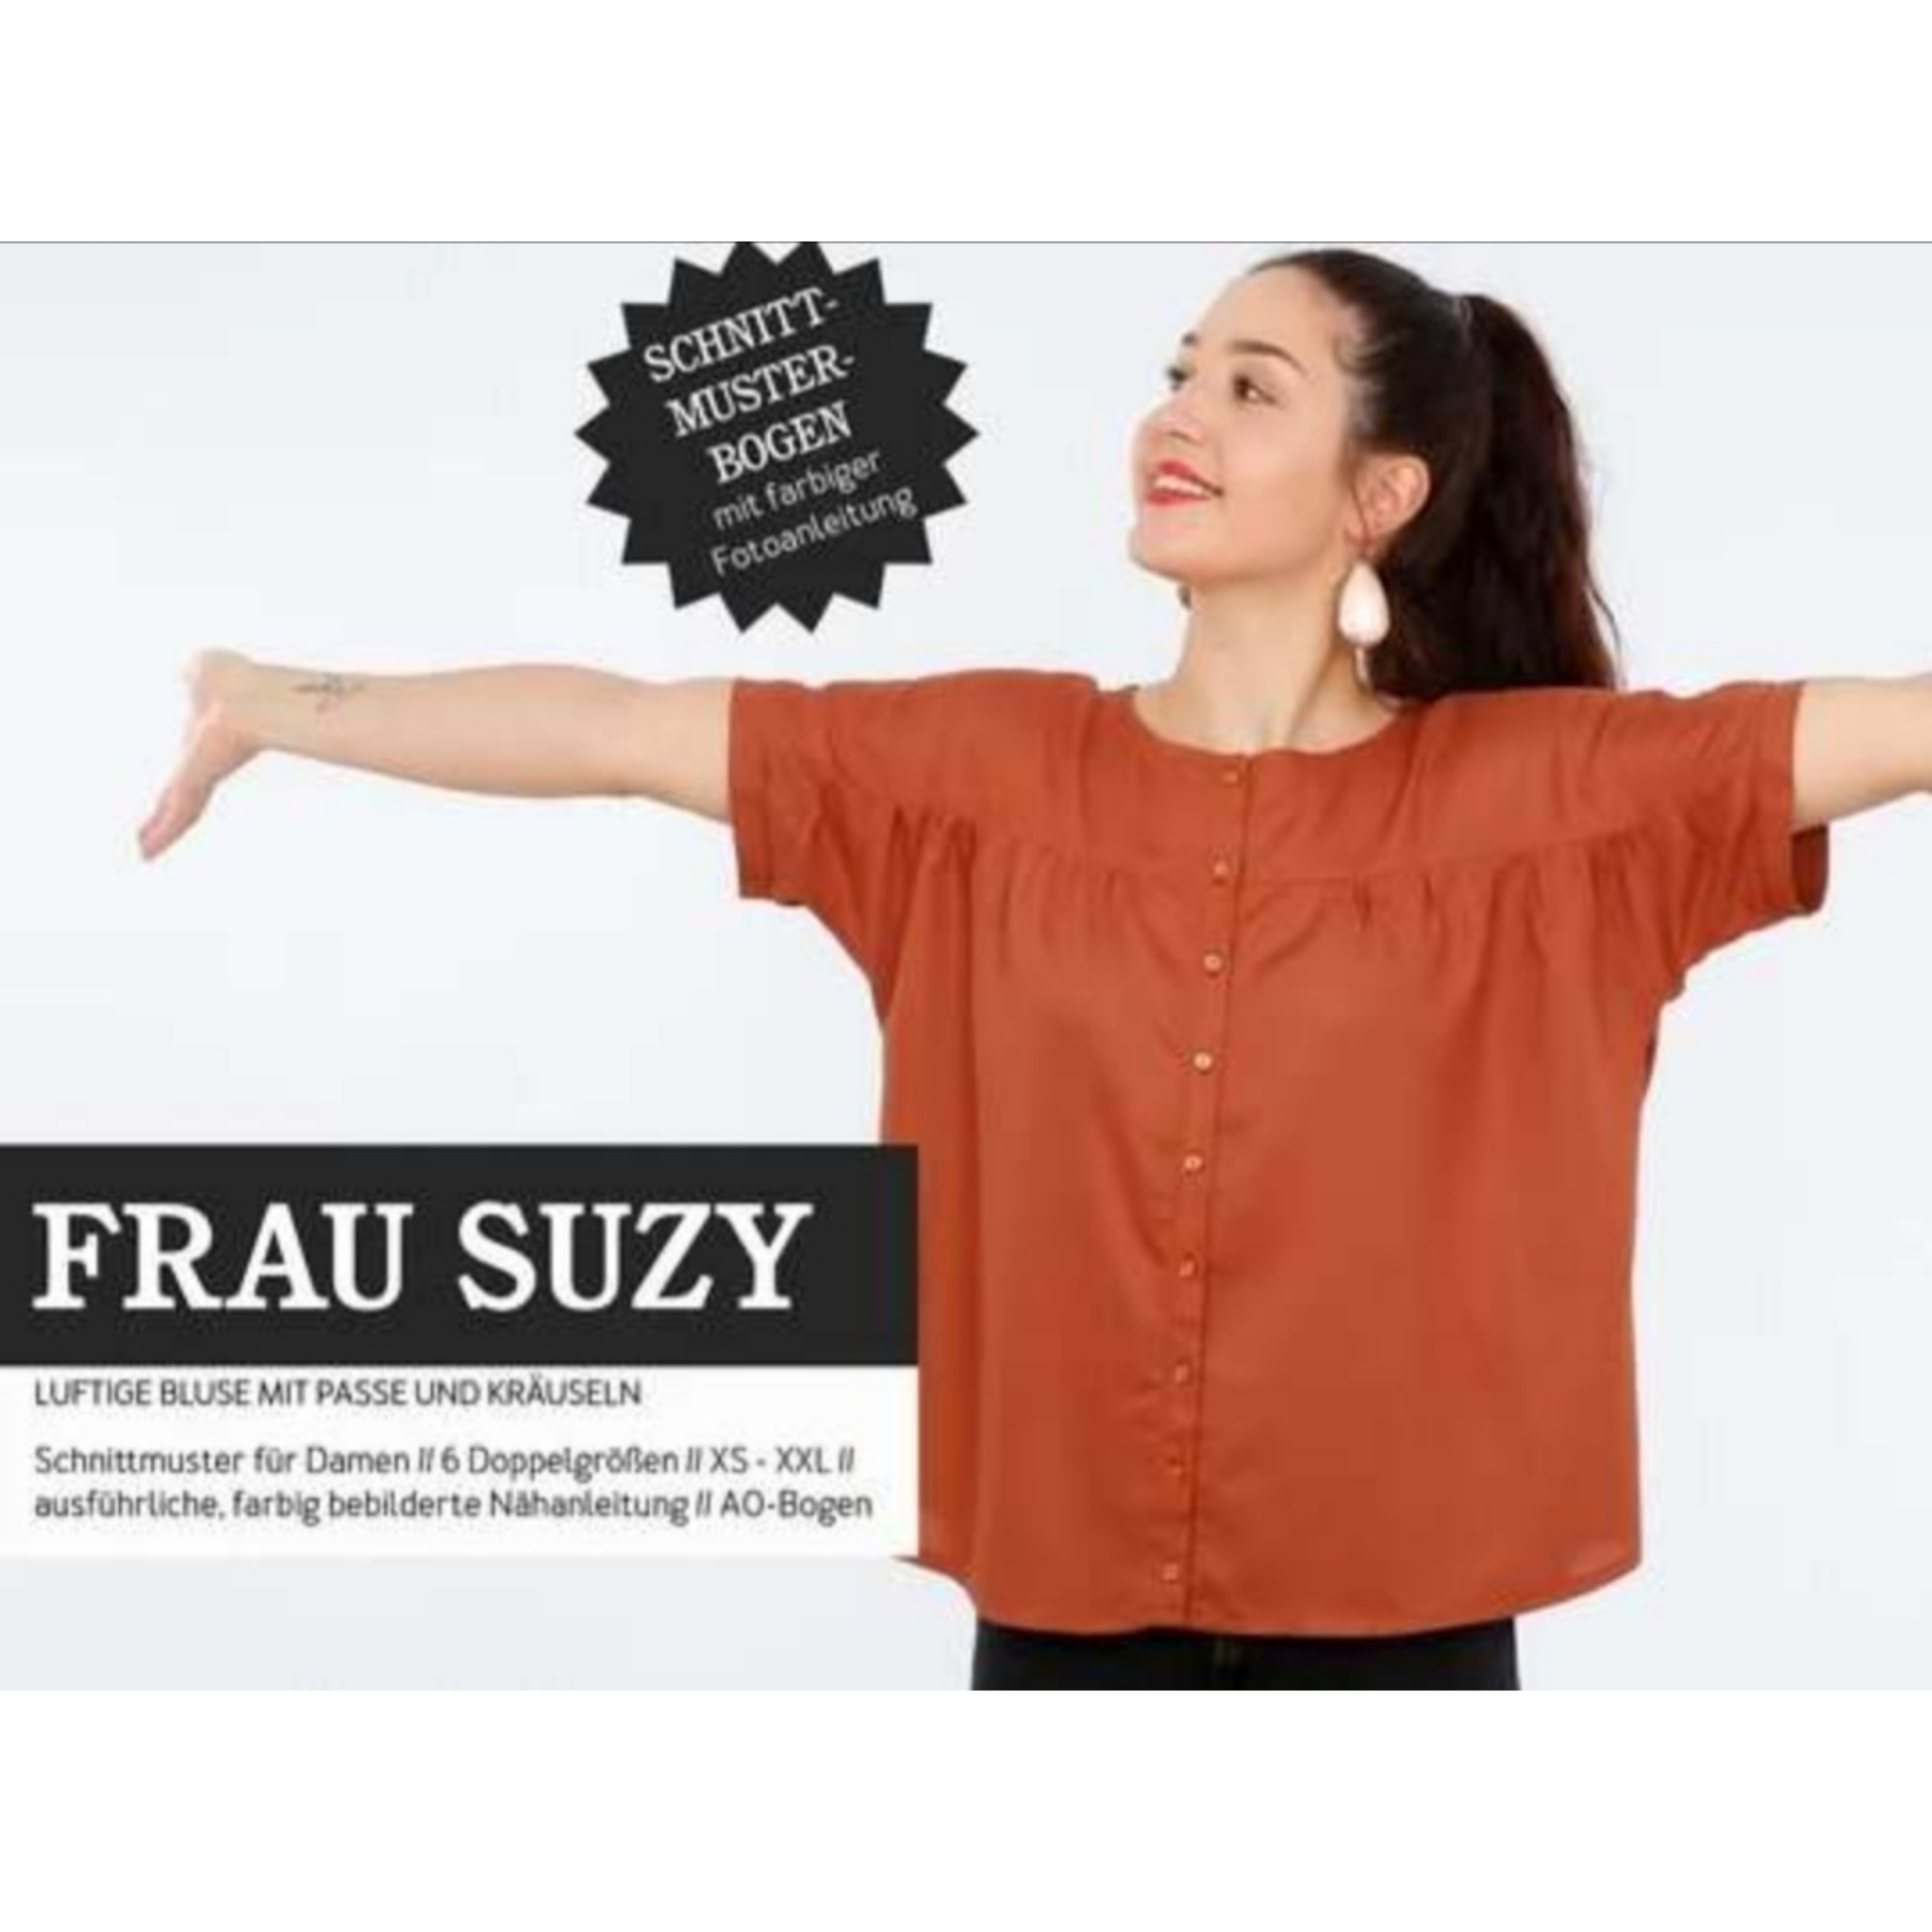 FRAU SUZYschnittmuster studio schnittreif